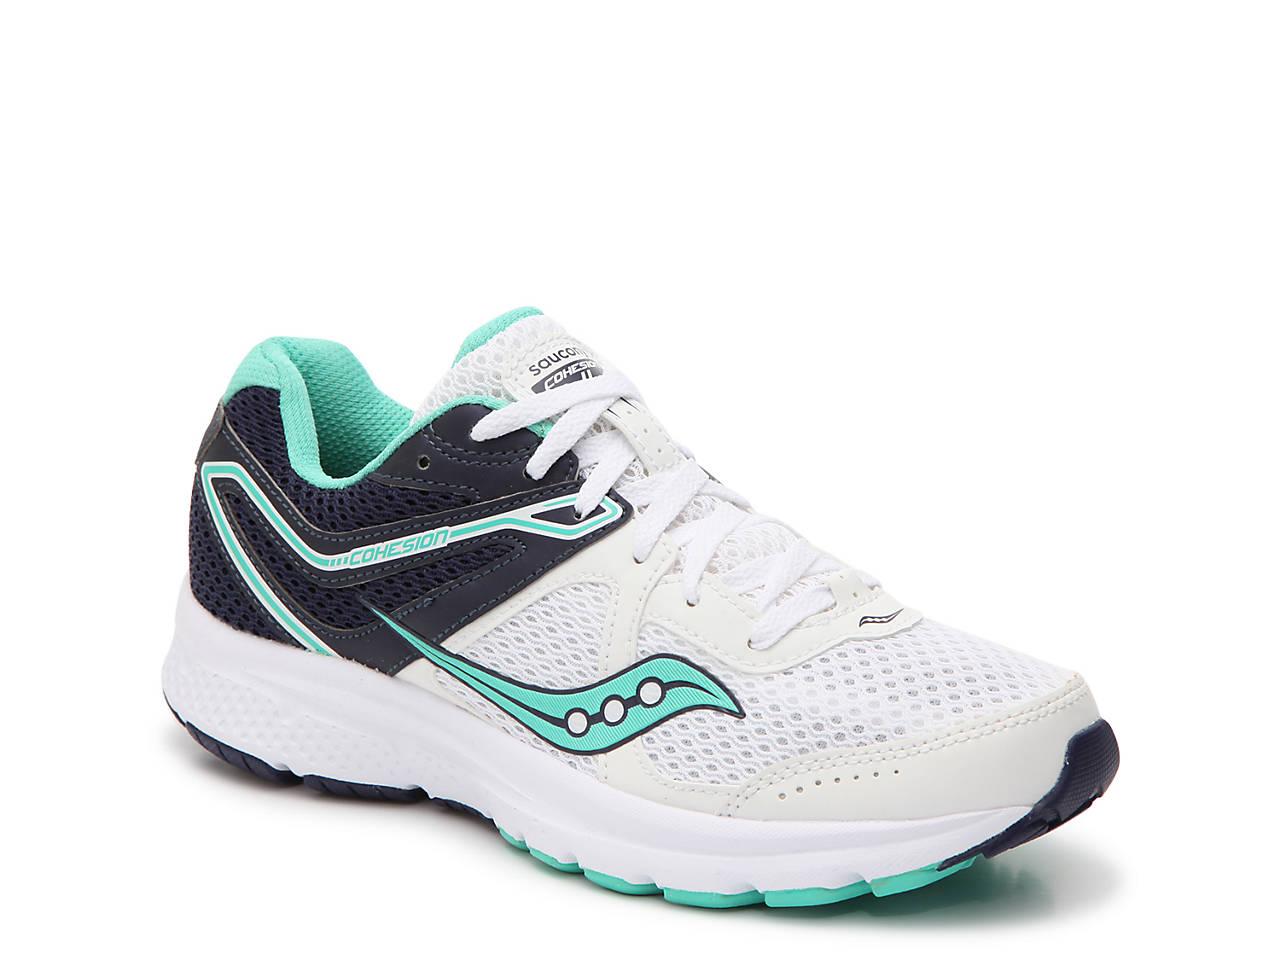 Saucony Cohesion 11 Running Shoe - Women s Women s Shoes  a999cba0e